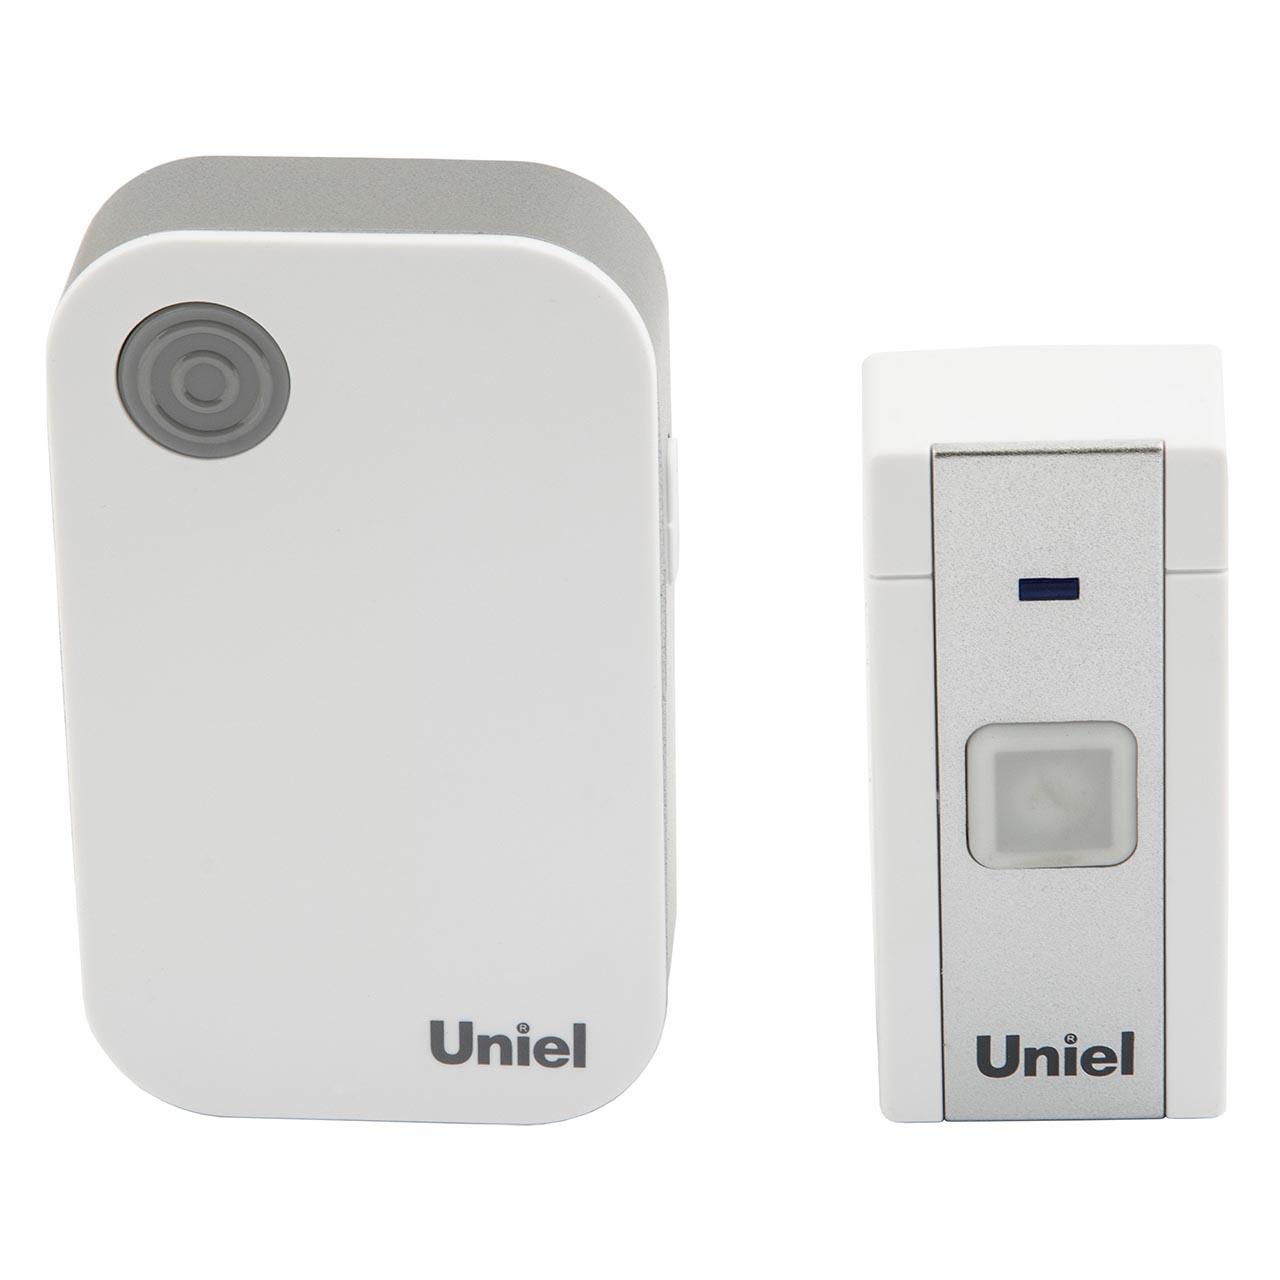 Звонок беспроводной Uniel udb-013w-r1t1-36s